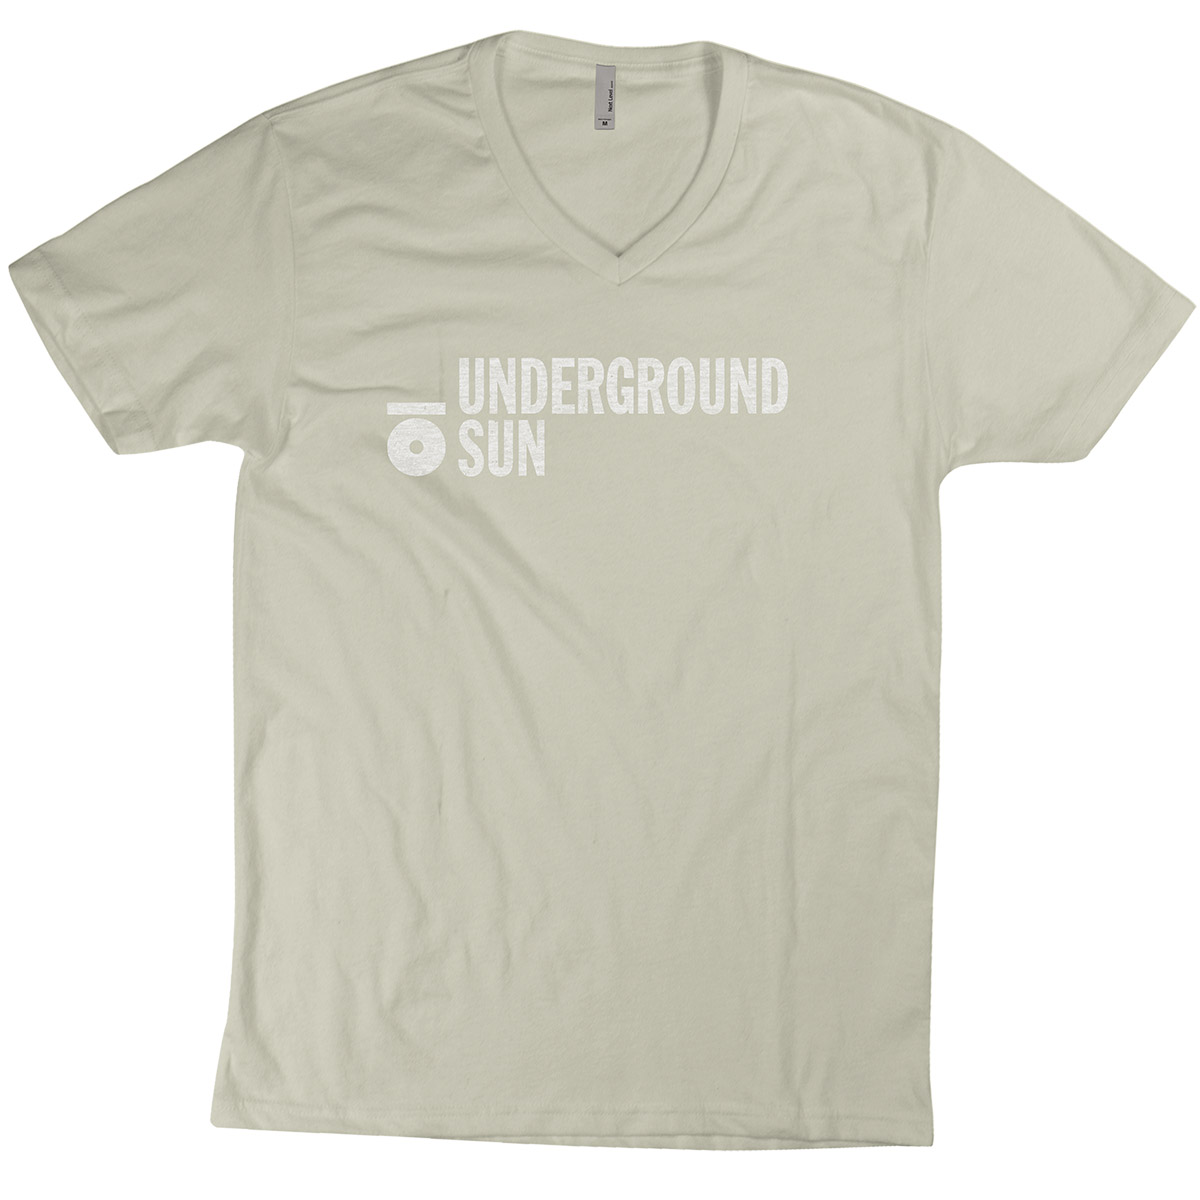 sand-vneck-white-logo-shirt-1200x1200